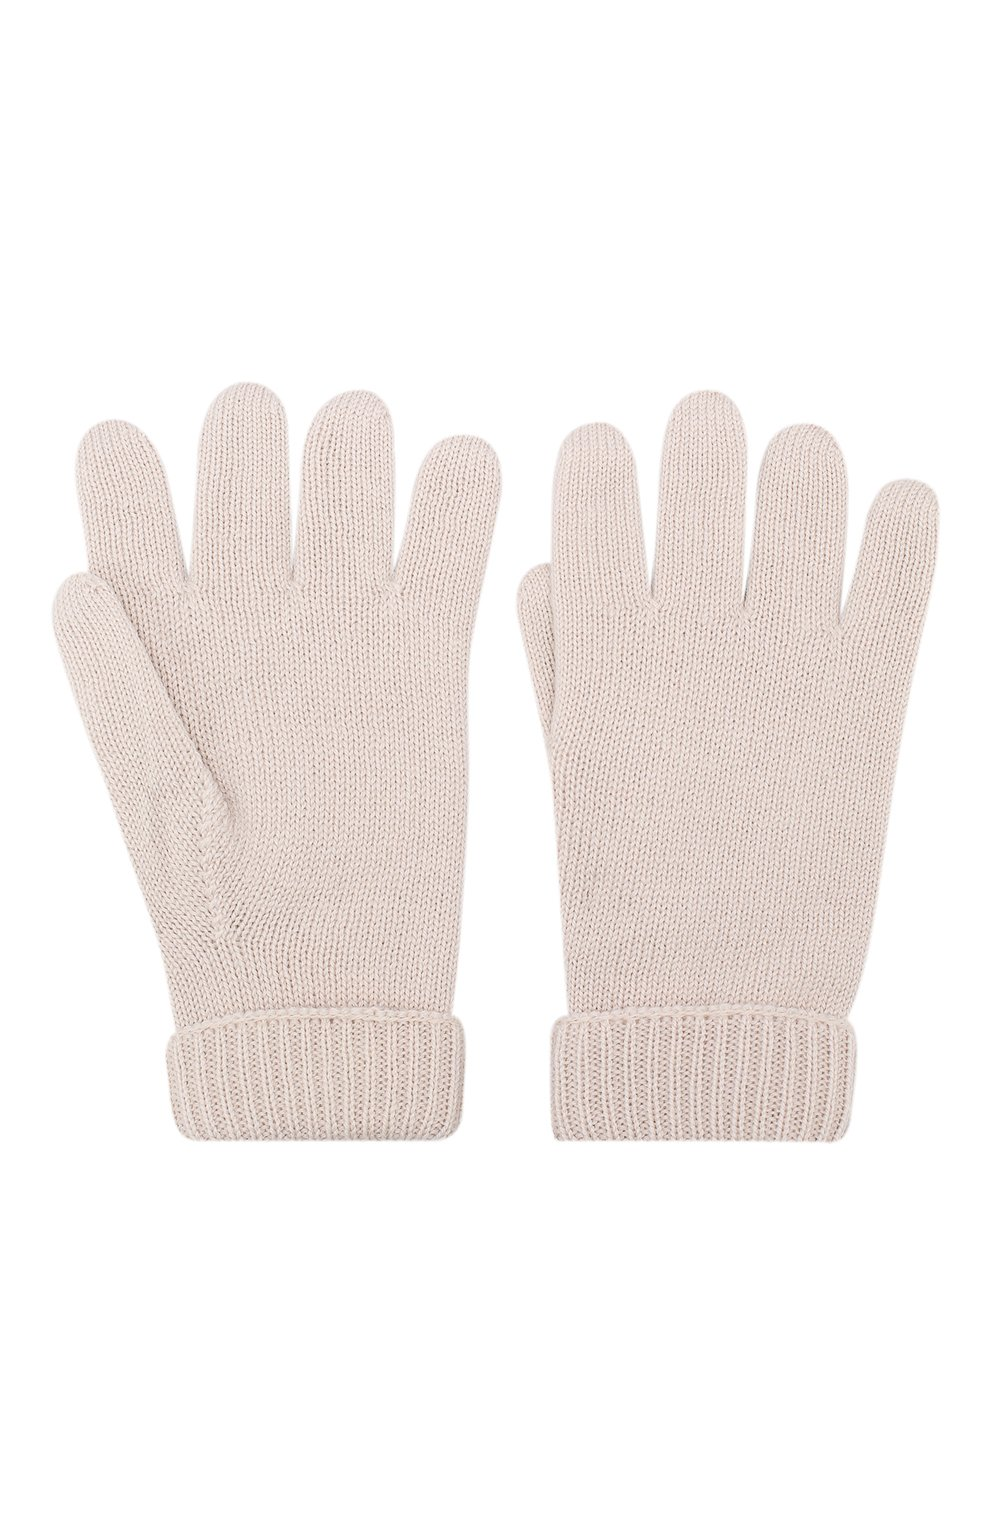 Детские шерстяные перчатки IL TRENINO бежевого цвета, арт. 19 9008/E0 | Фото 2